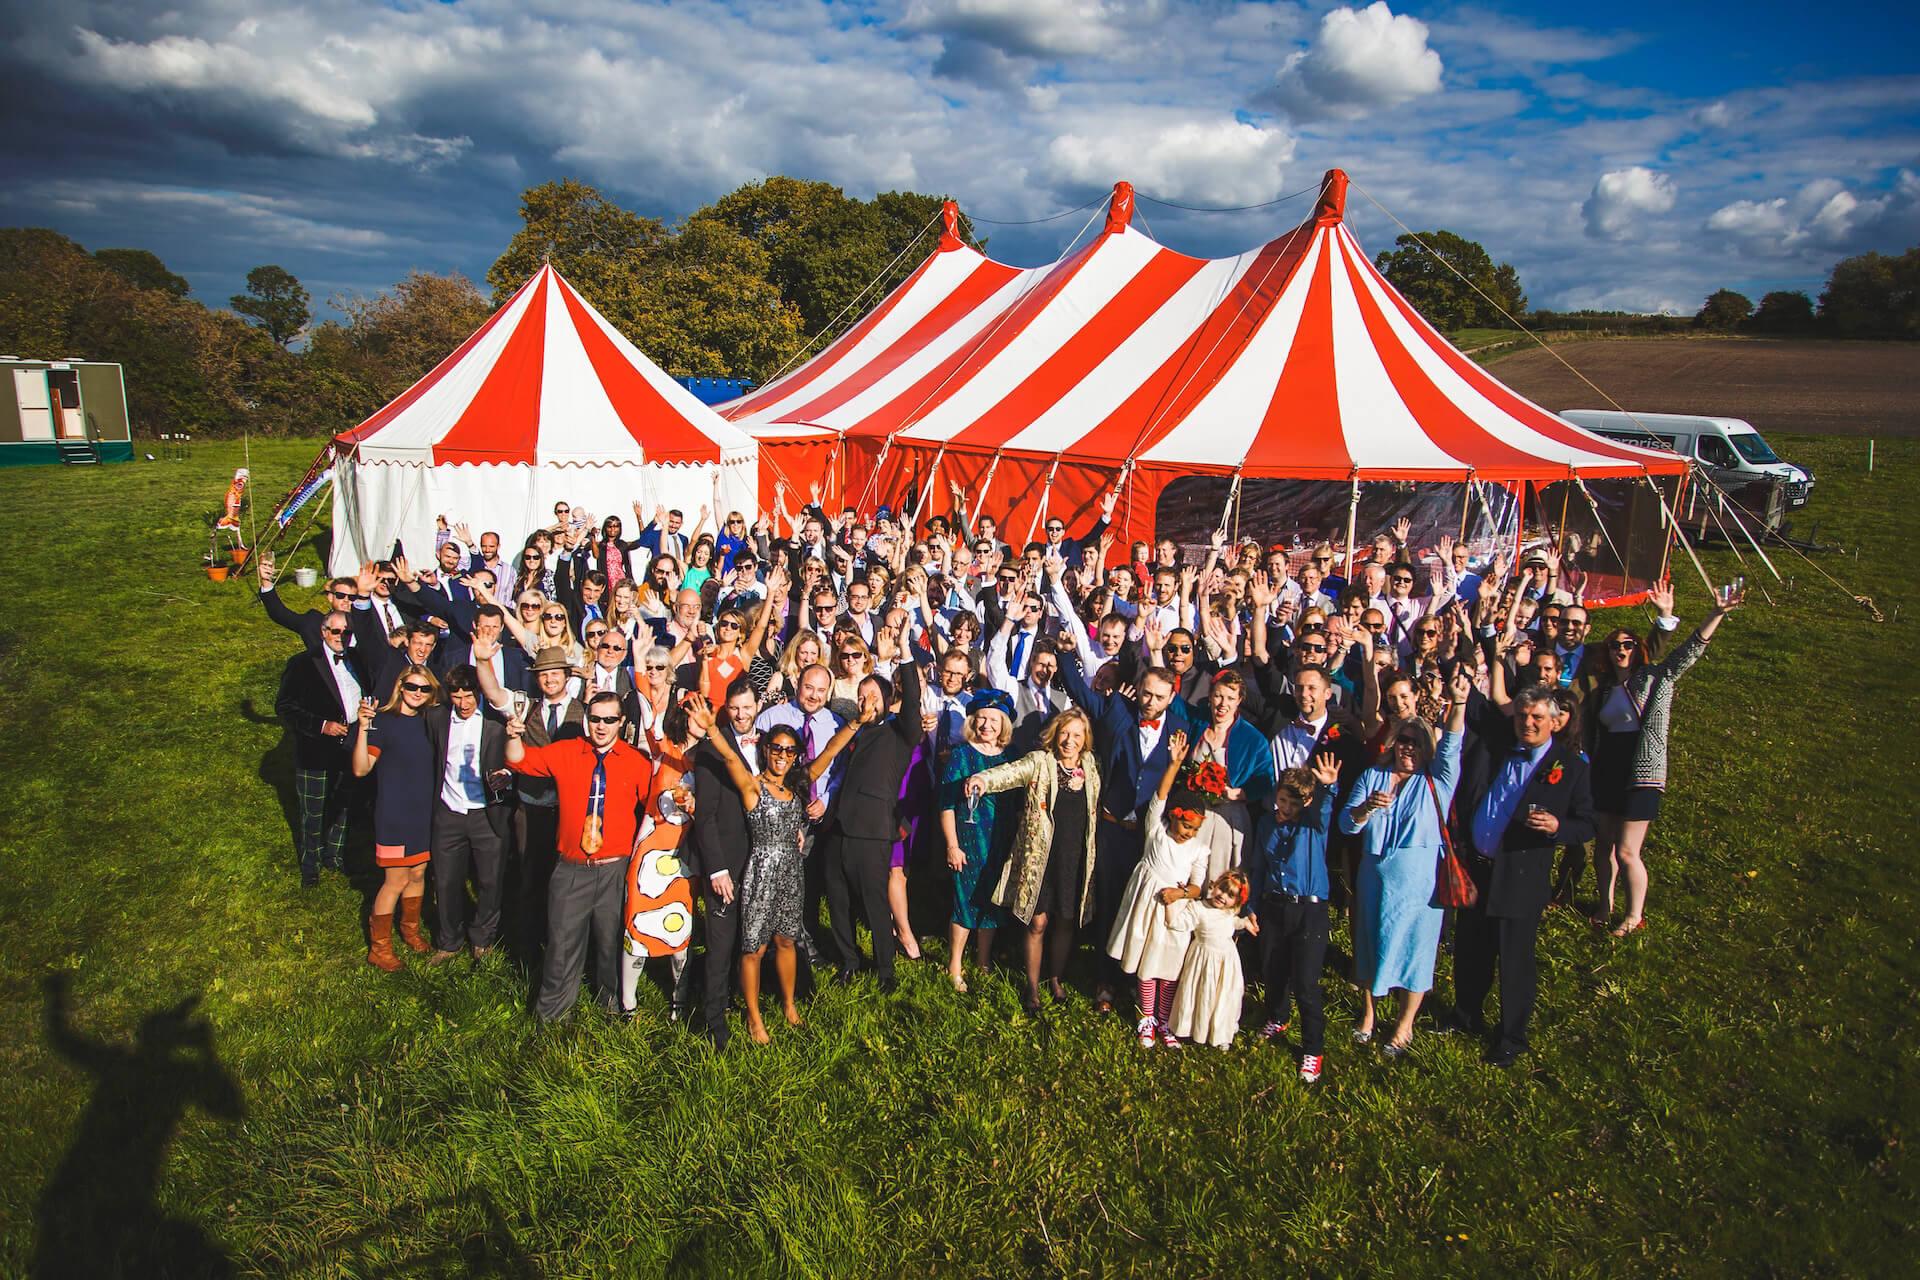 Big 'Wedfest' party